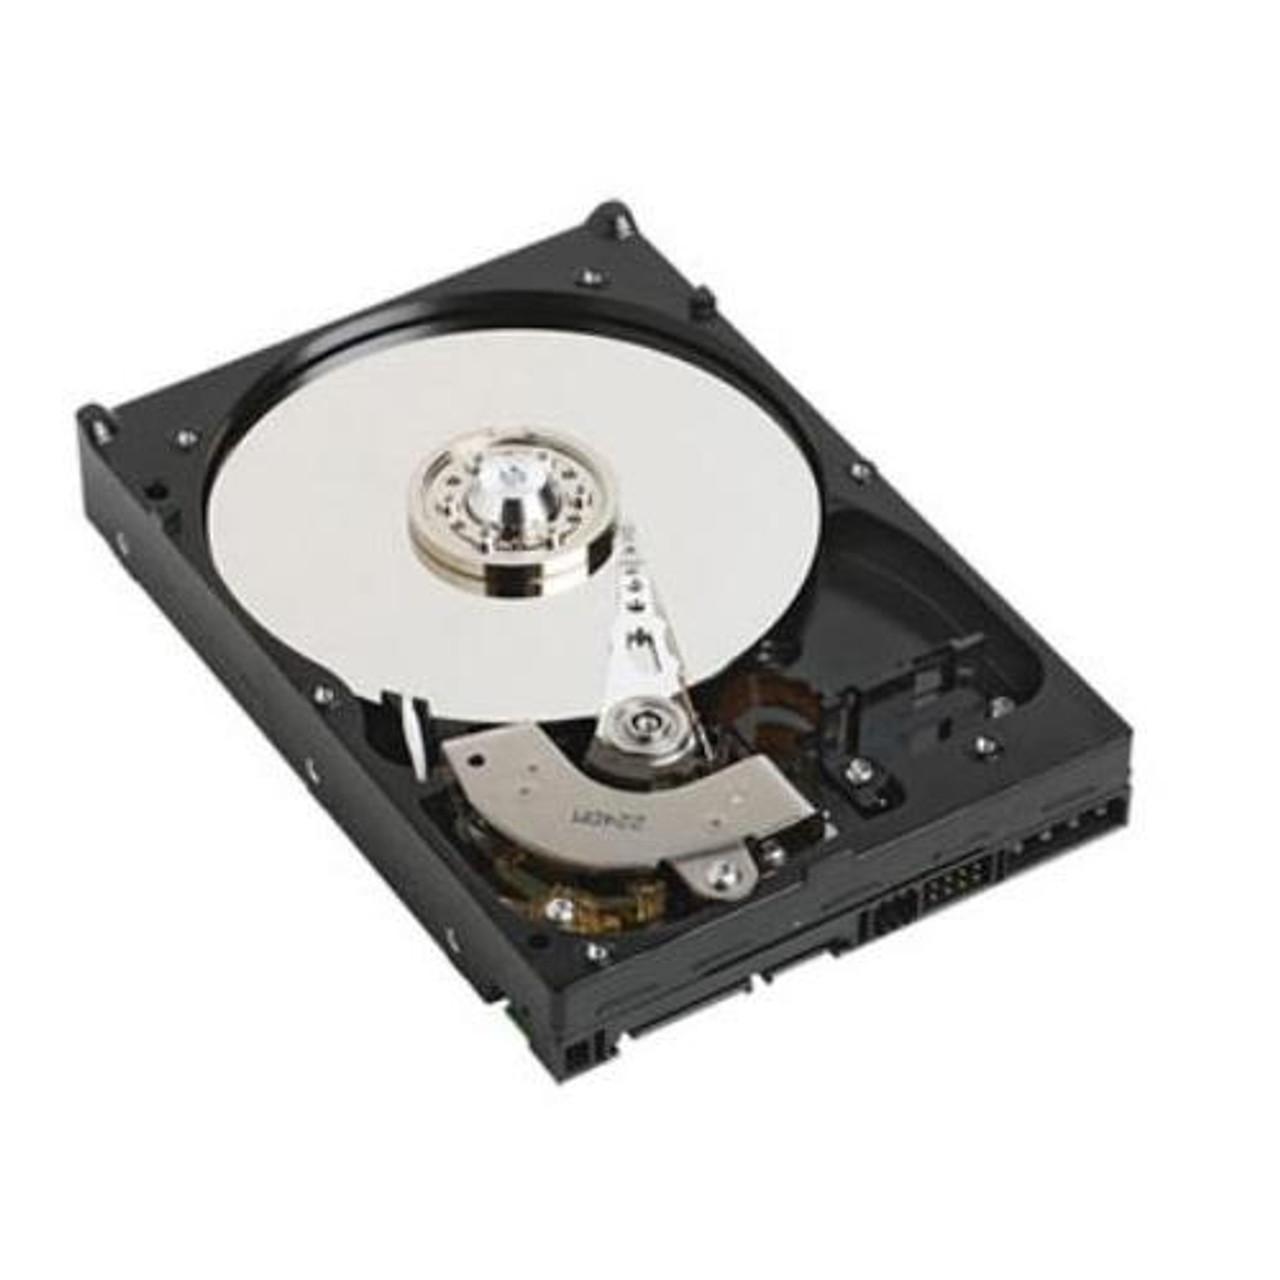 "Western Digital WD6400AAKS 640GB 7200RPM 3.5/"" SATA Hard Drive Refurbished"